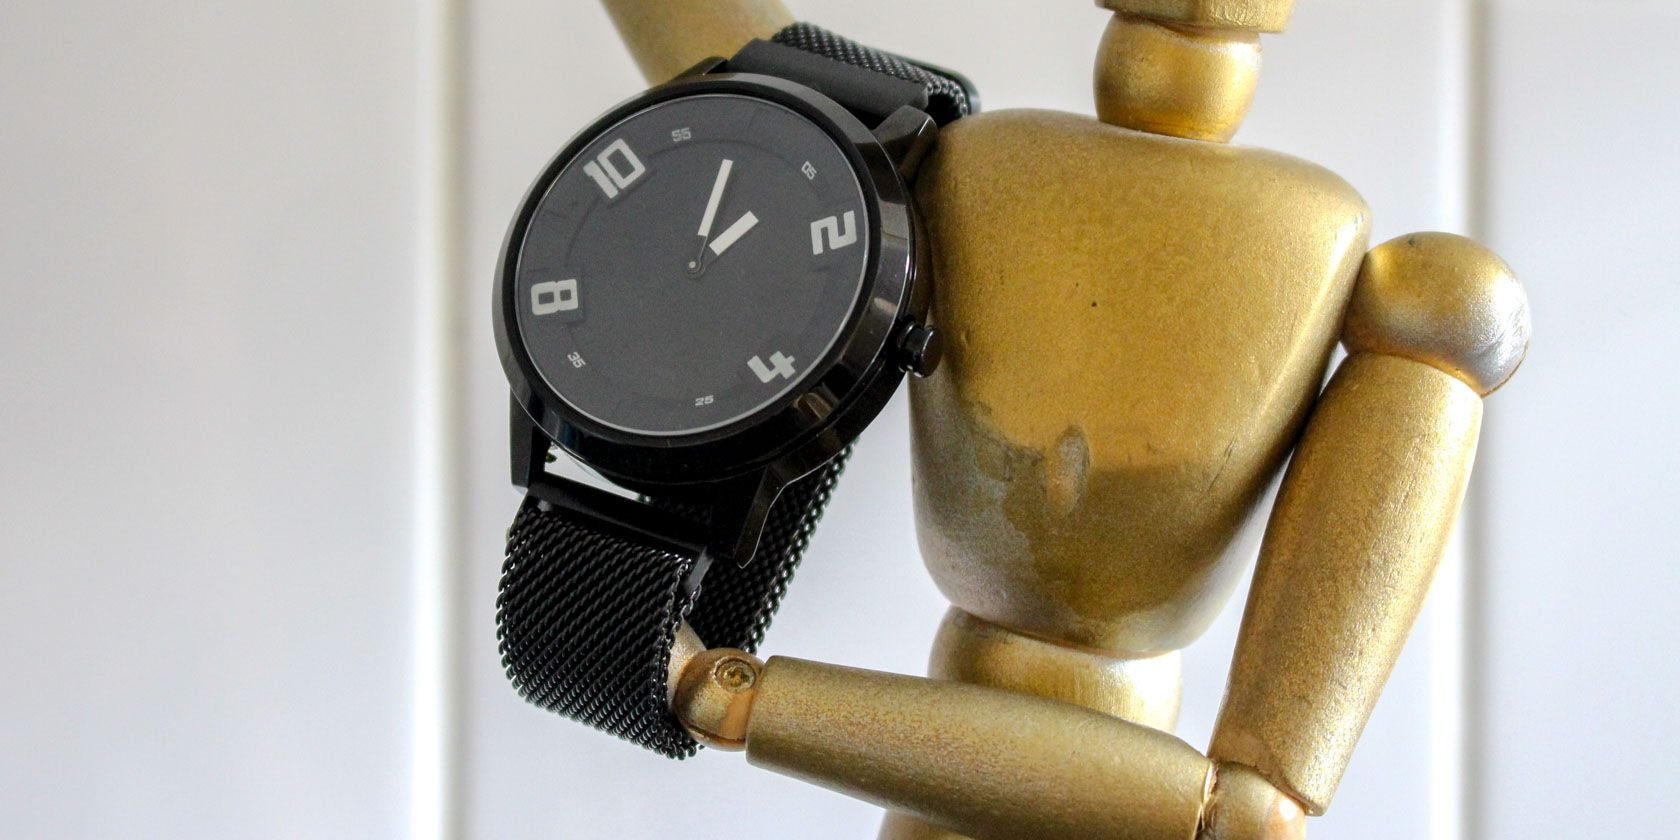 Fitness Smart Technology Kody Beige Nokha Boot Women 39 Lenovos Watch X Is An Attractive But Terrible Smartwatch